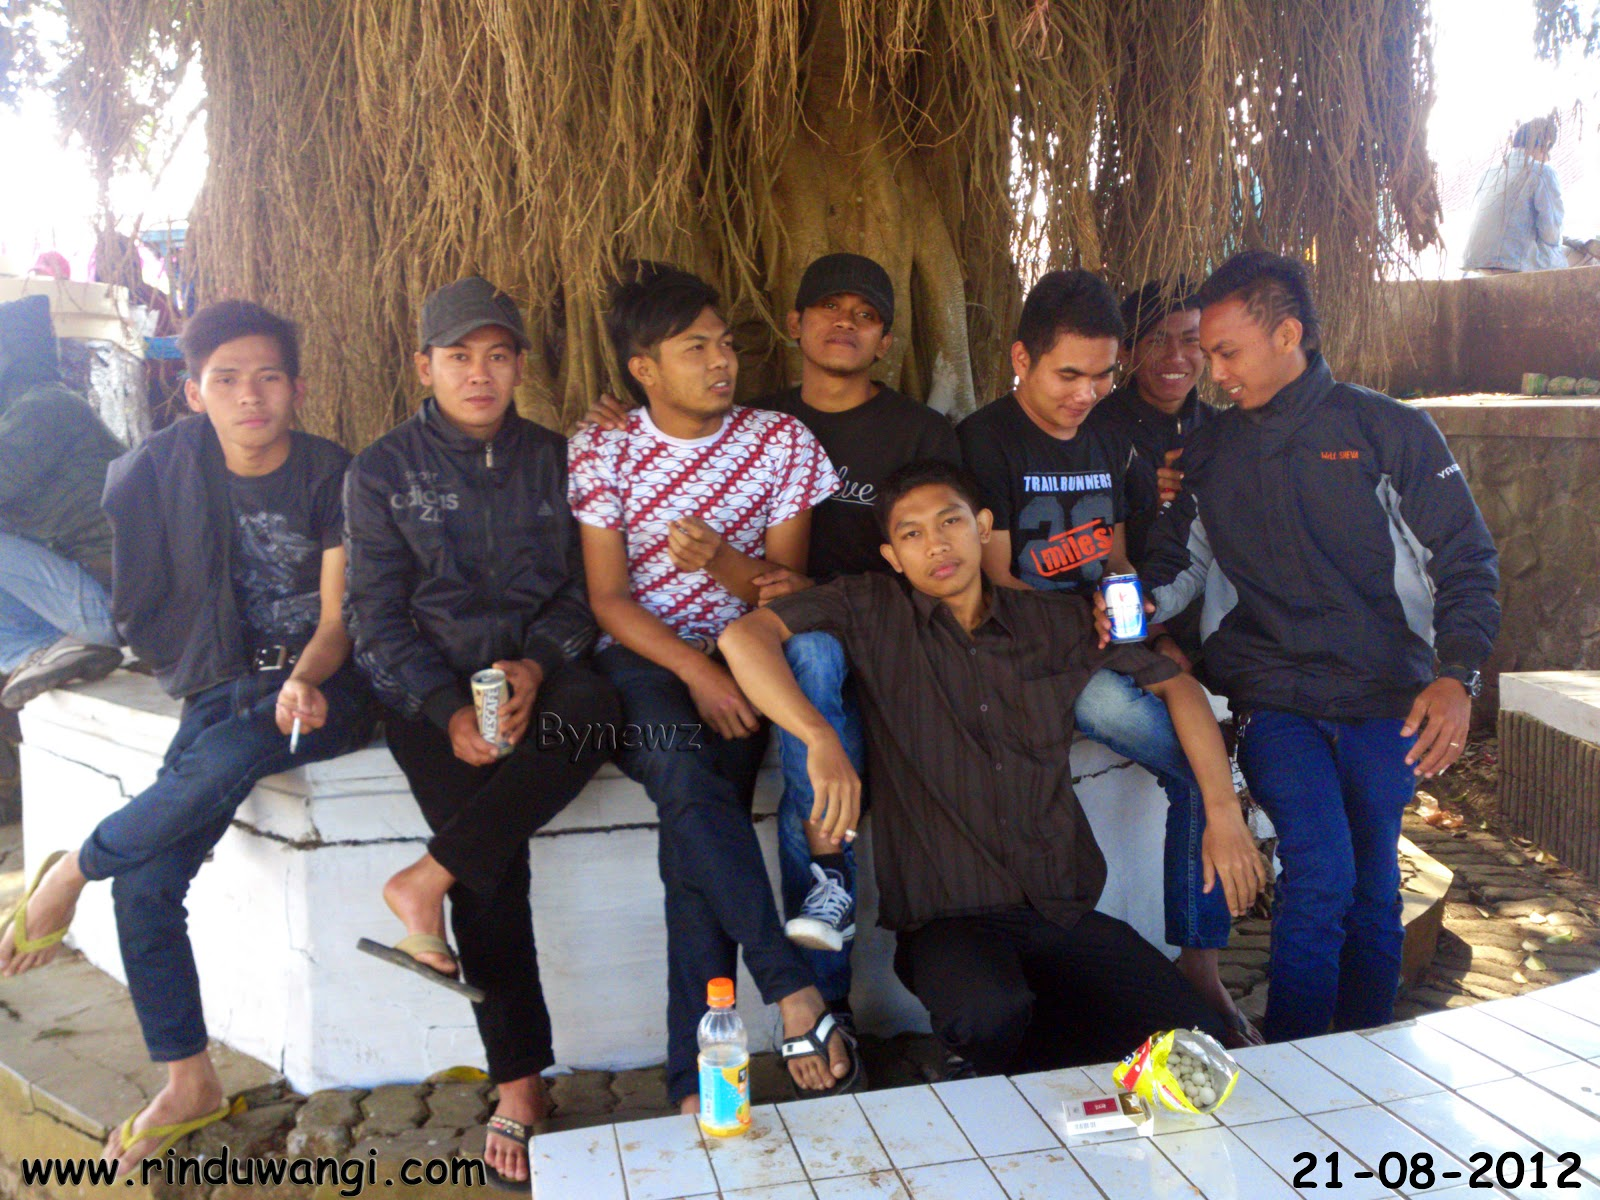 Copyright © Bynewz, Panjalu, 21 Agustus 2012